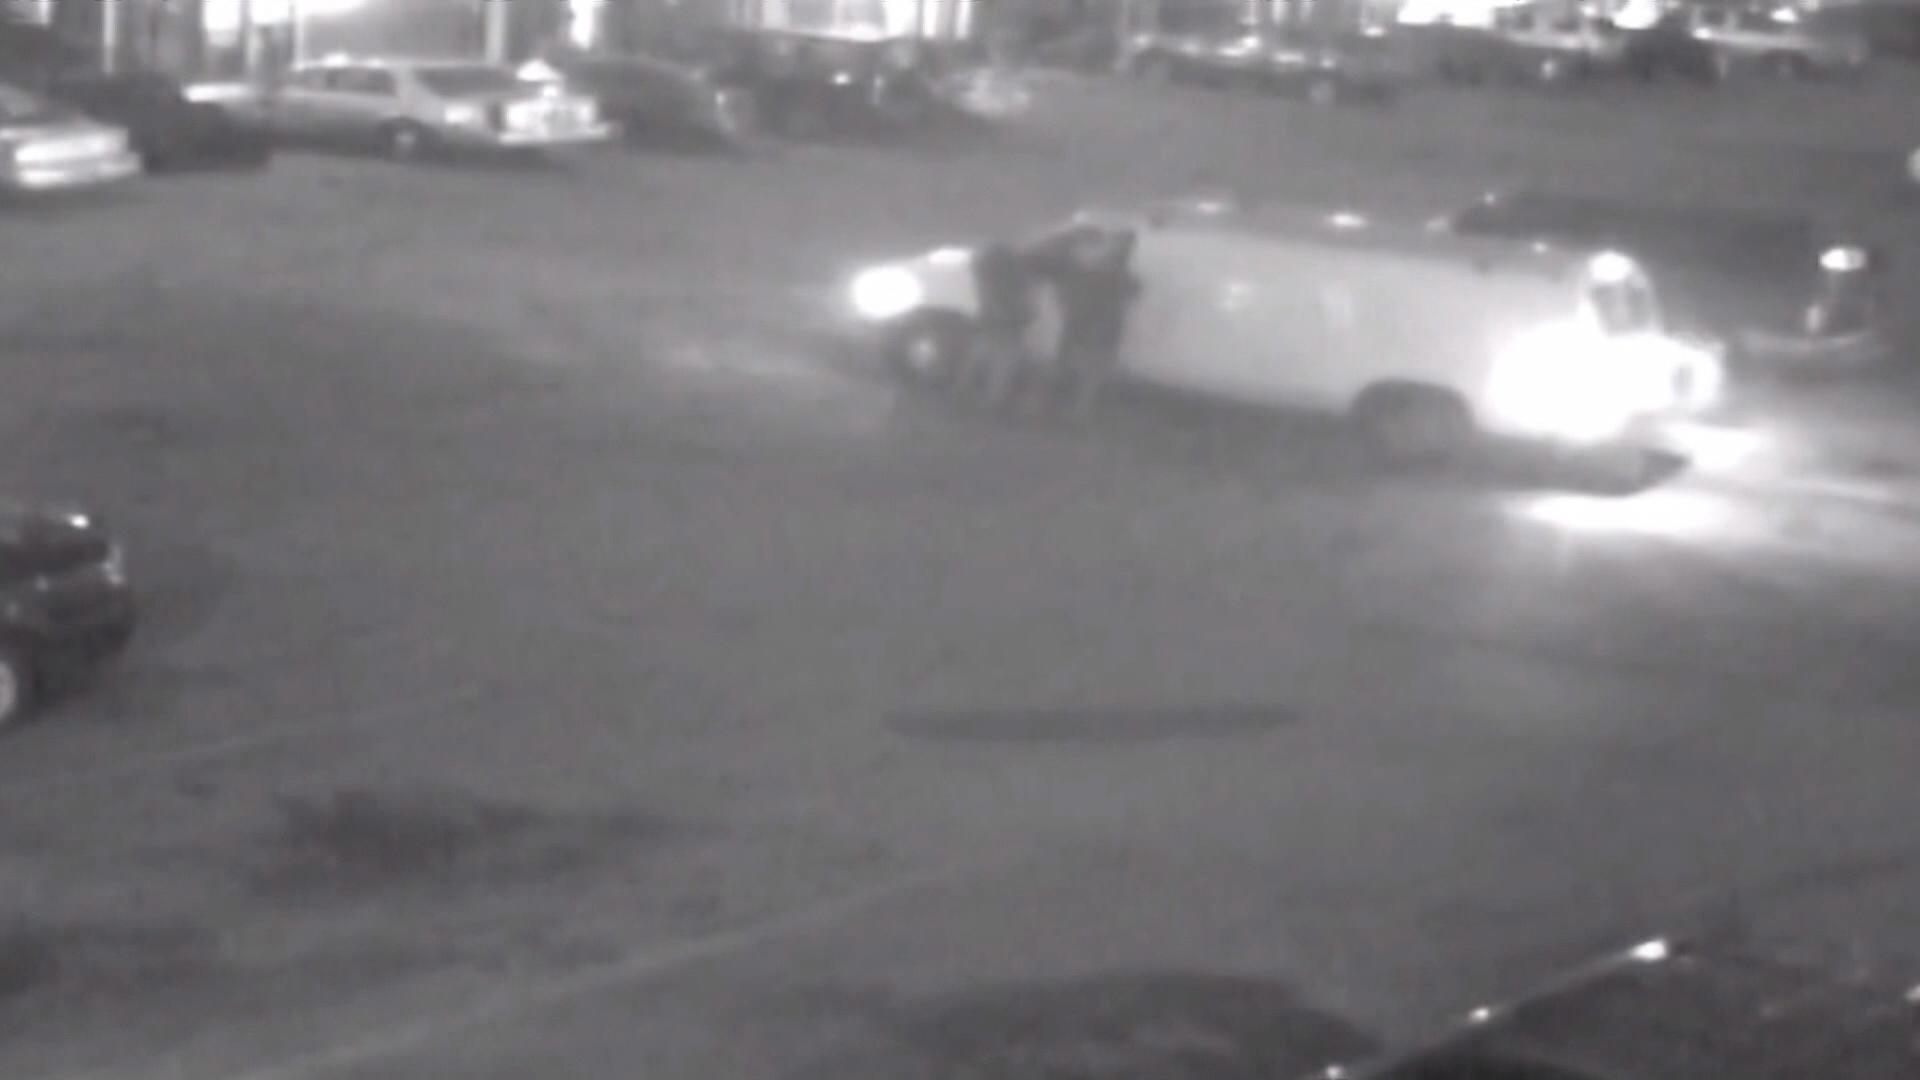 Memphis police disciplines 9 after homicide victim left in impounded car for weeks